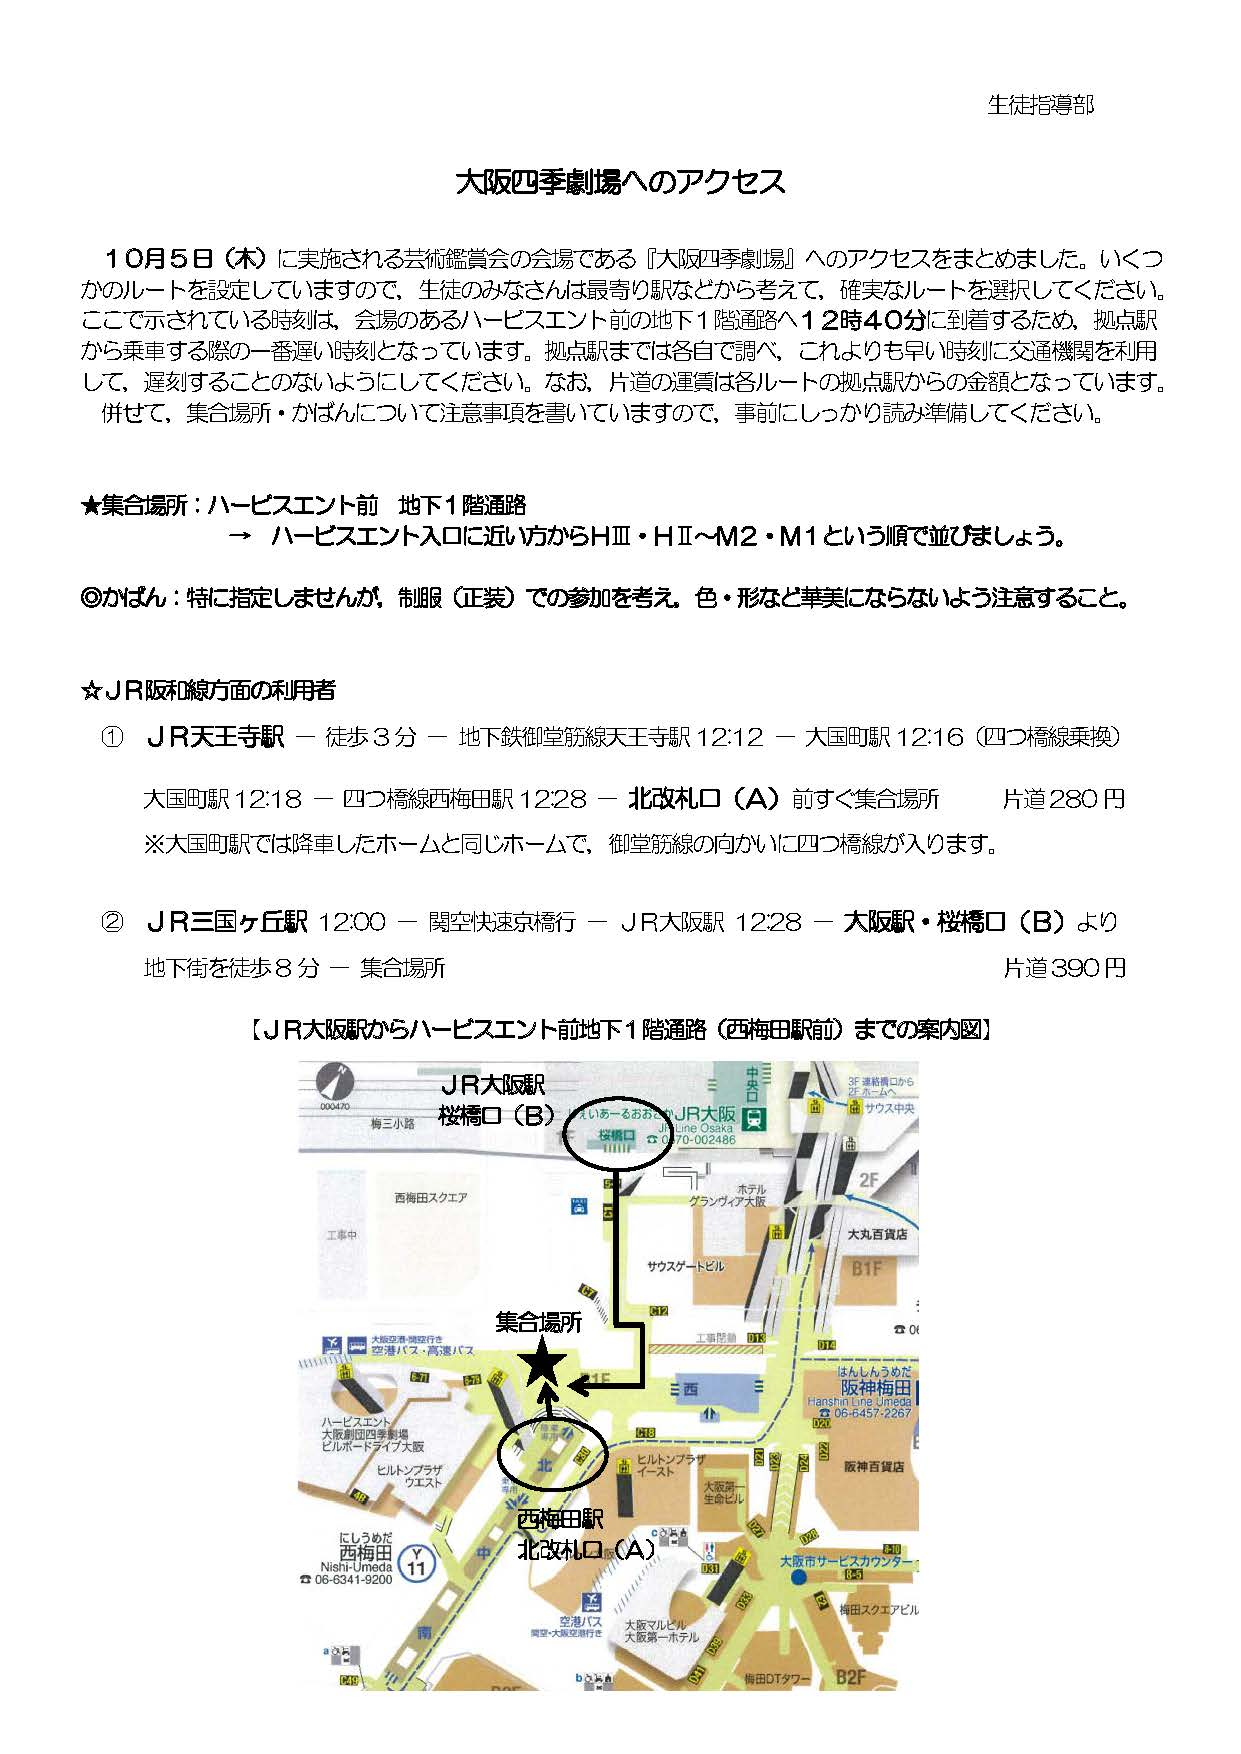 大阪四季劇場_ページ_1